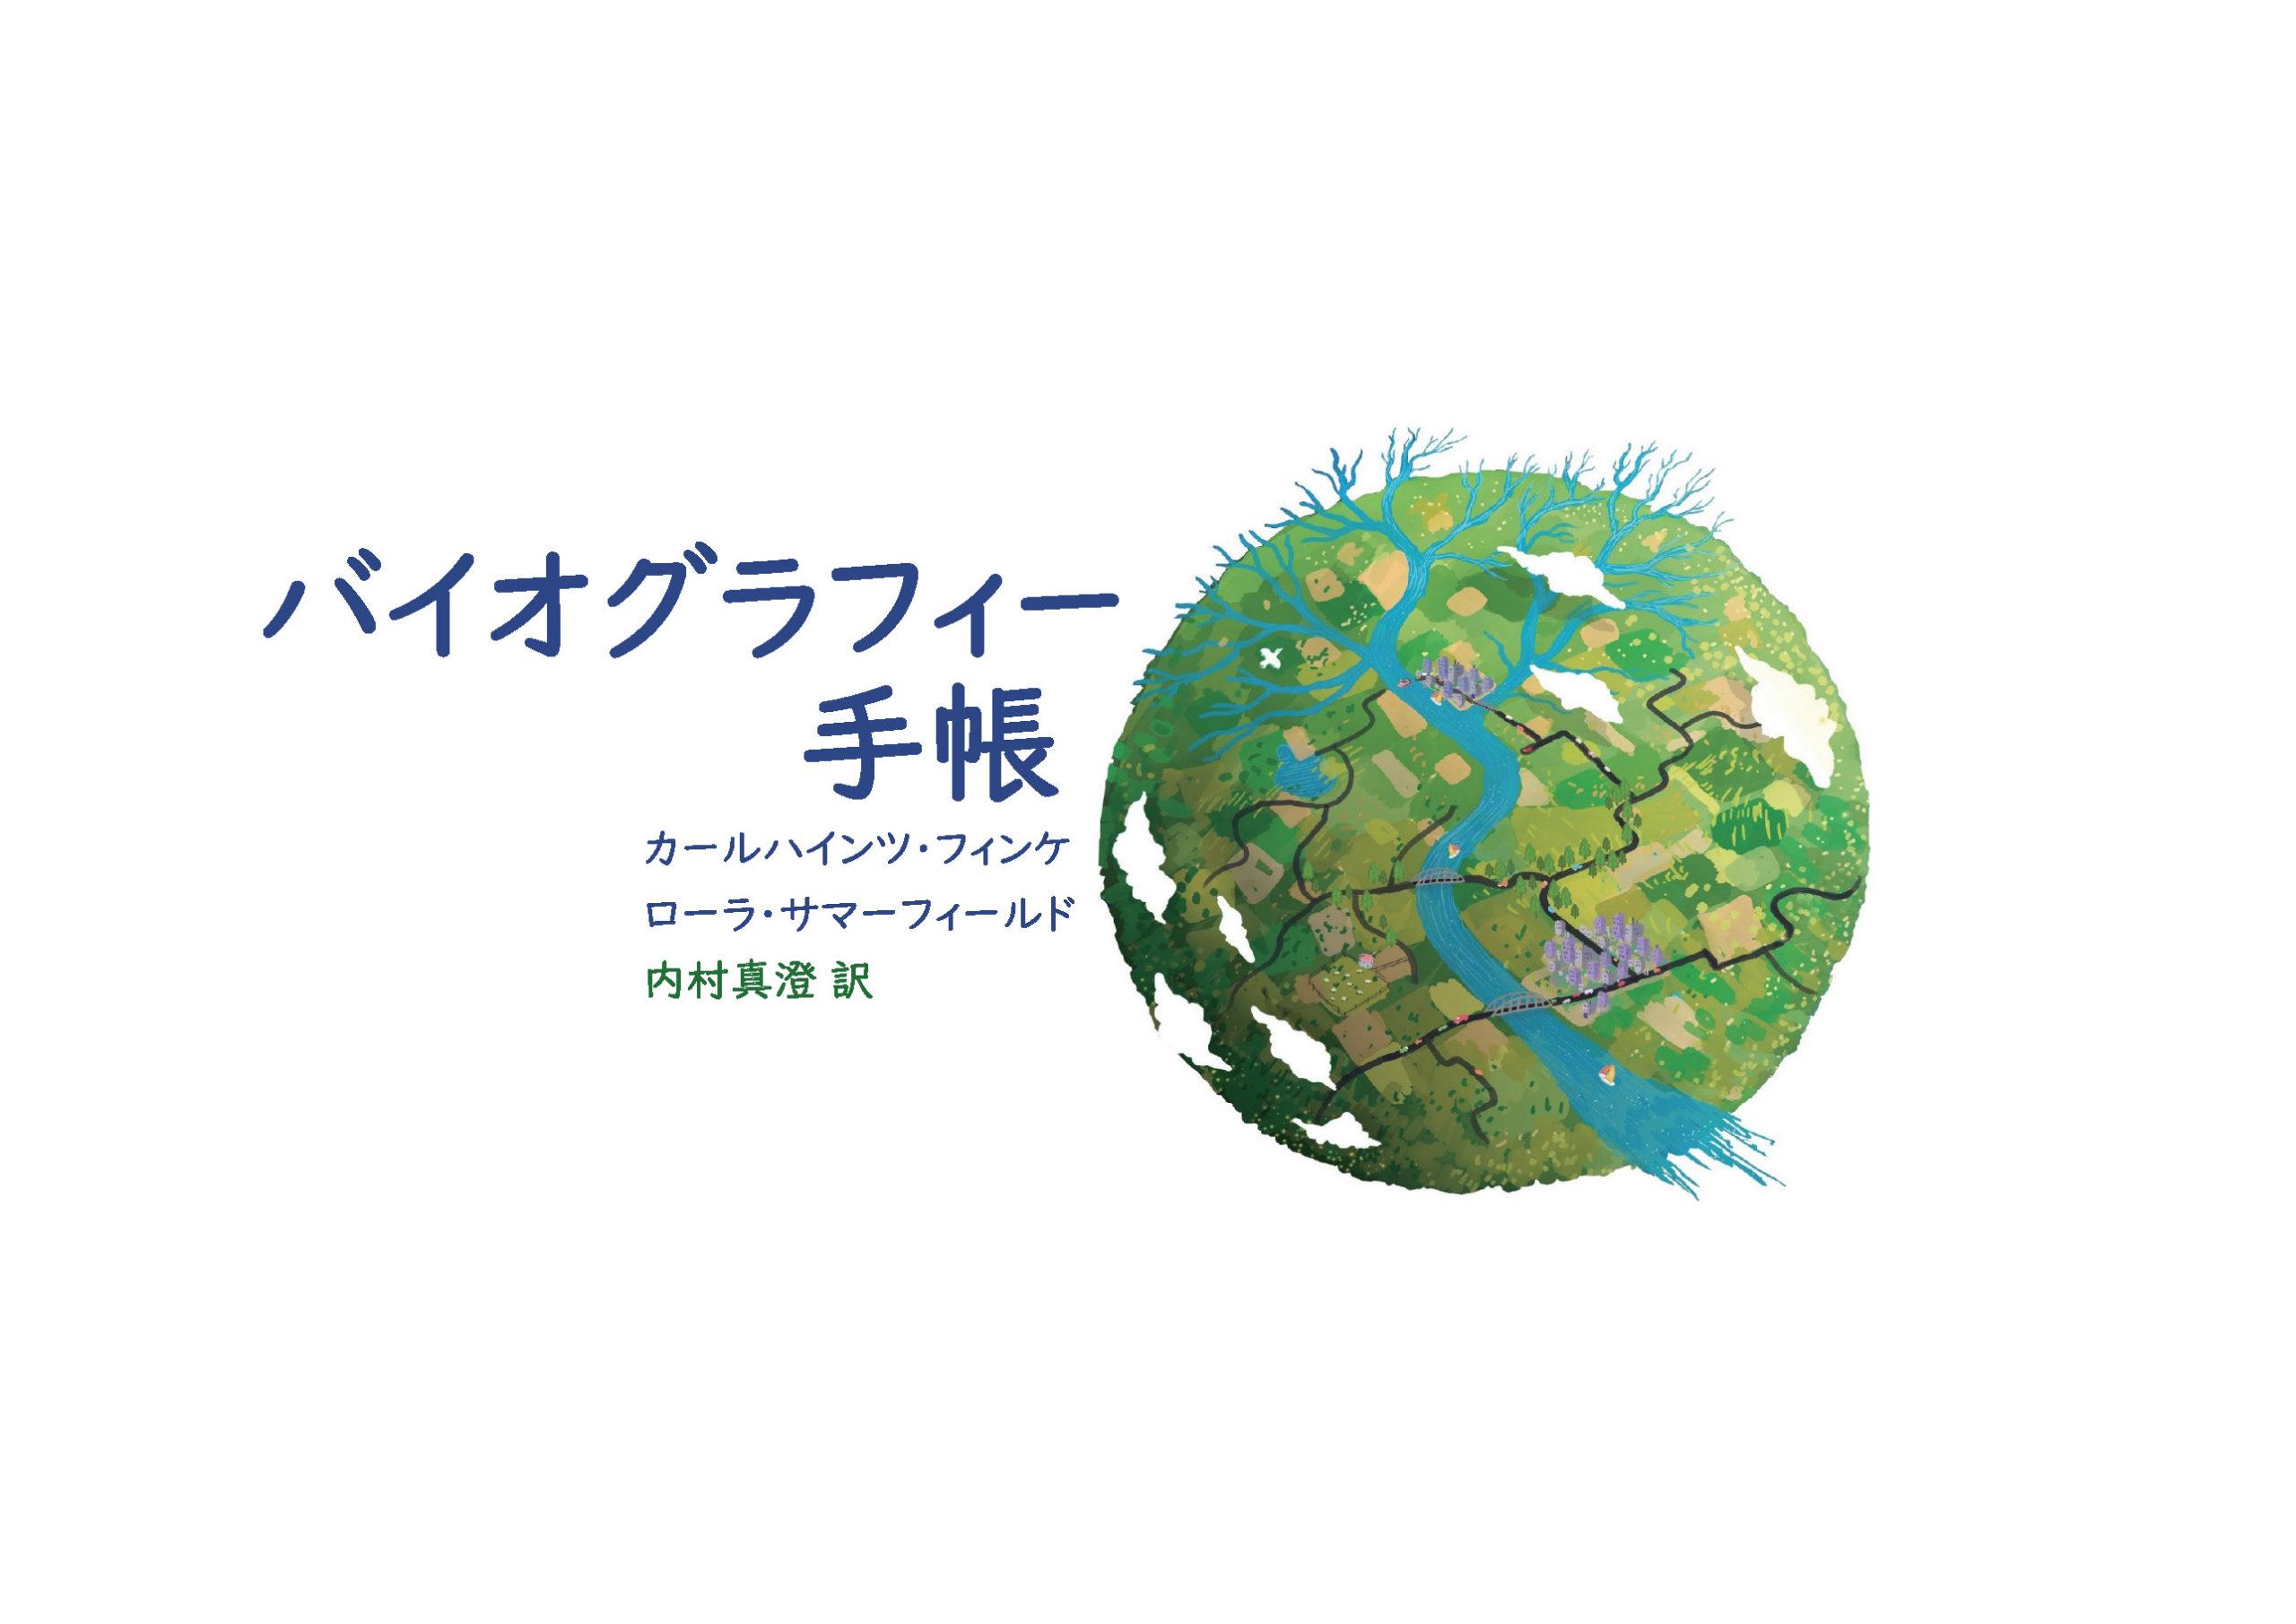 eLog-book Japanese